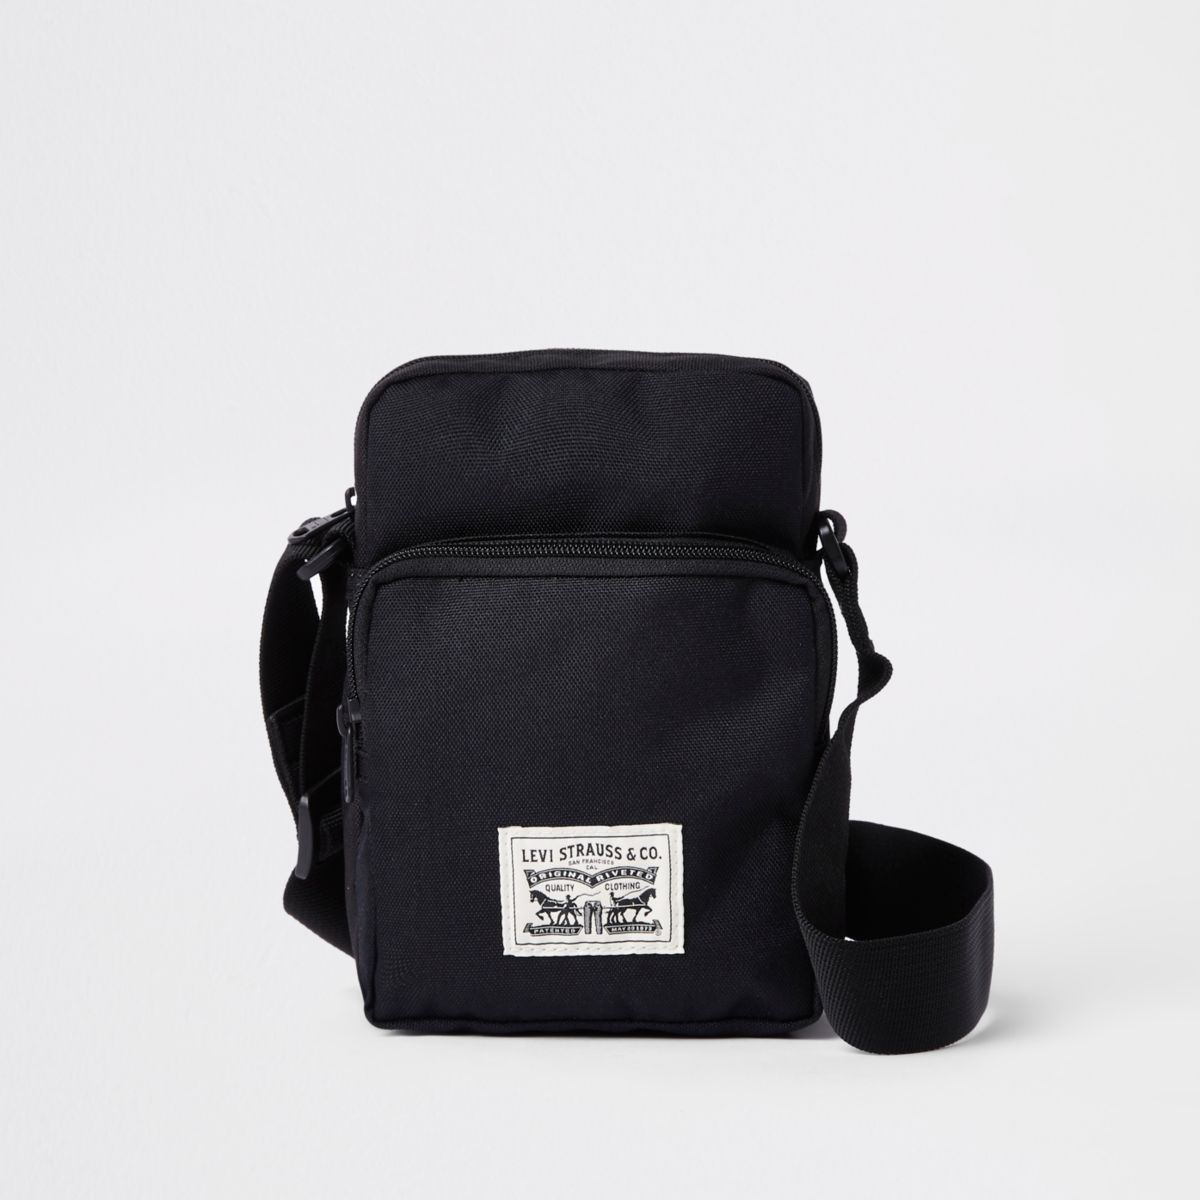 Levi's black cross body bag